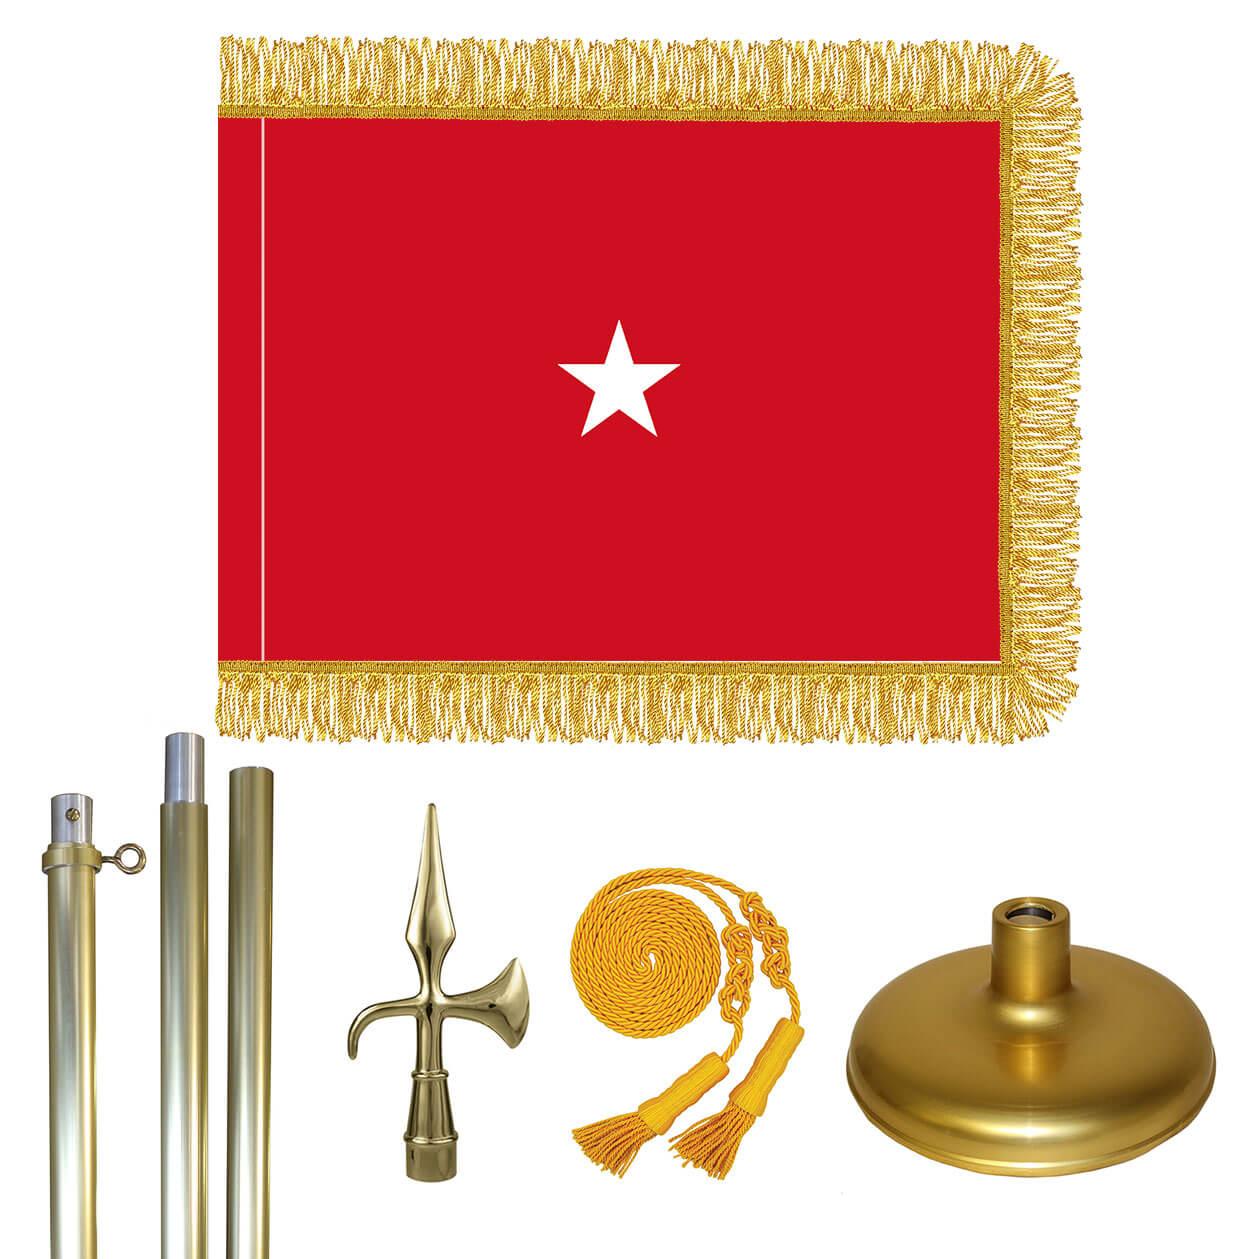 Brass marine corps brigadier general flag kit marine corps brigadier general flag kit brass pole buycottarizona Image collections